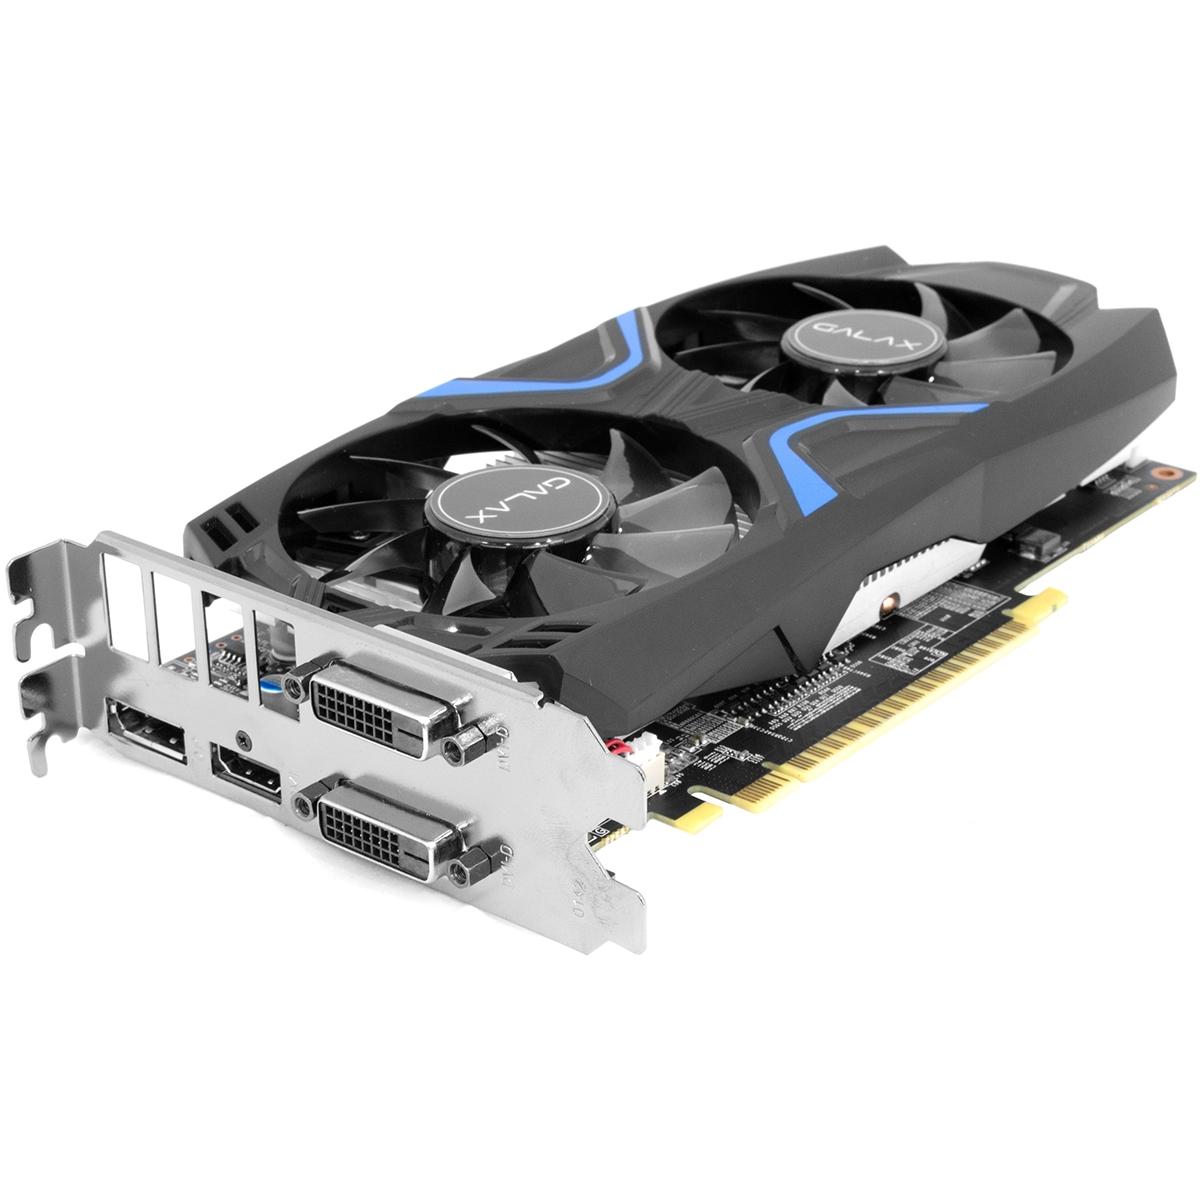 Placa de Vídeo Galax GeForce GTX 1050 Ti EXOC Dual, 4GB GDDR5, 128Bit, 50IQH8DVN6EC